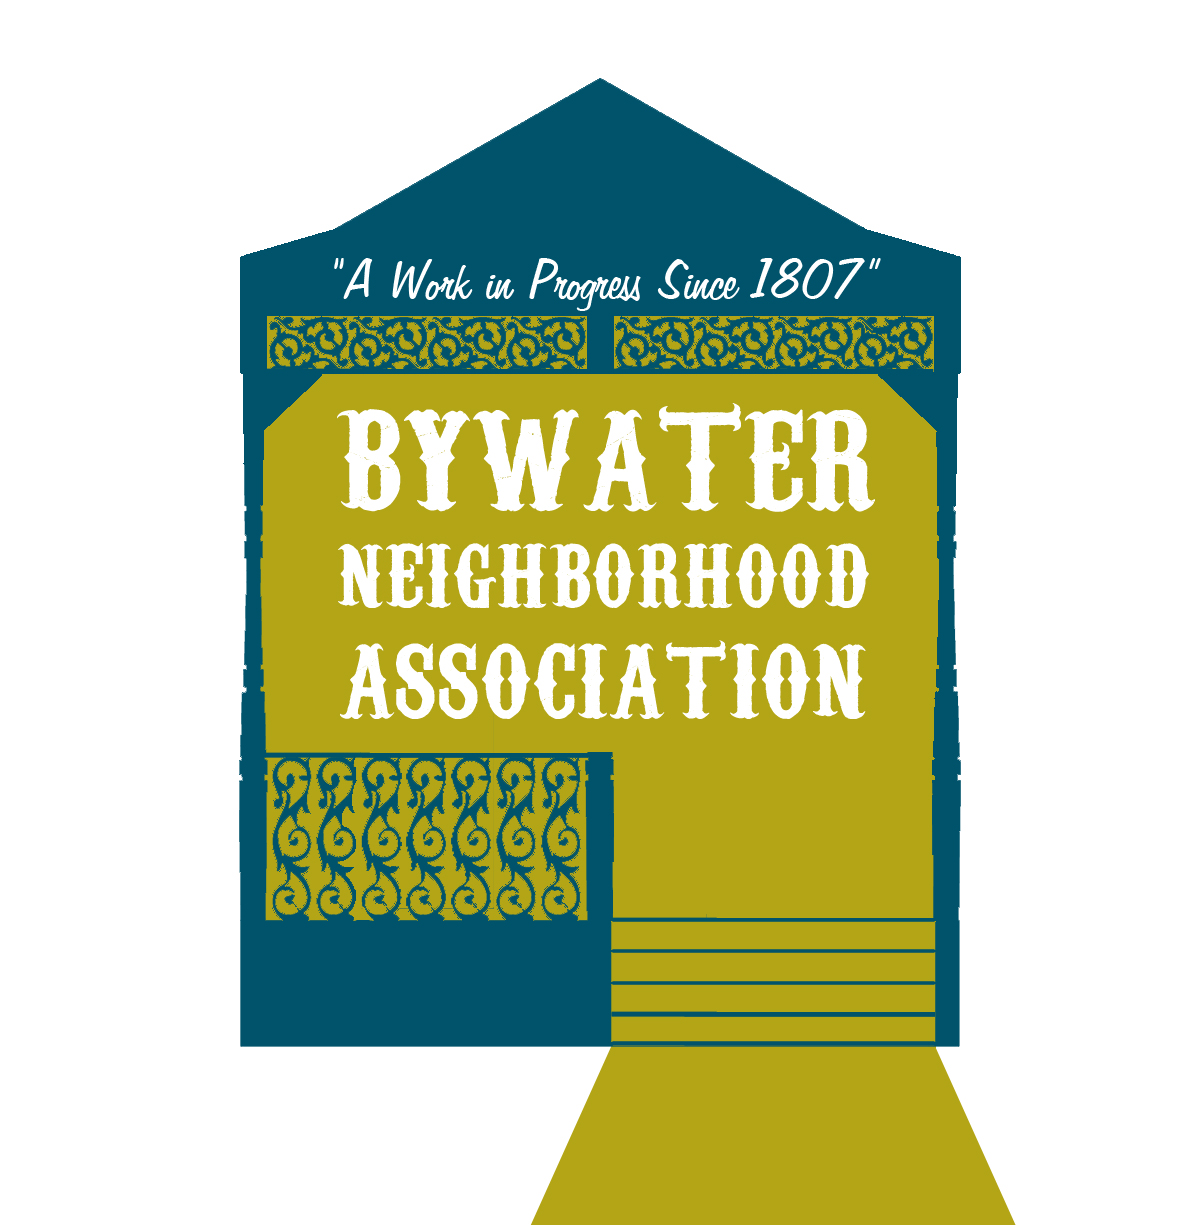 Bywater Neighborhood Association